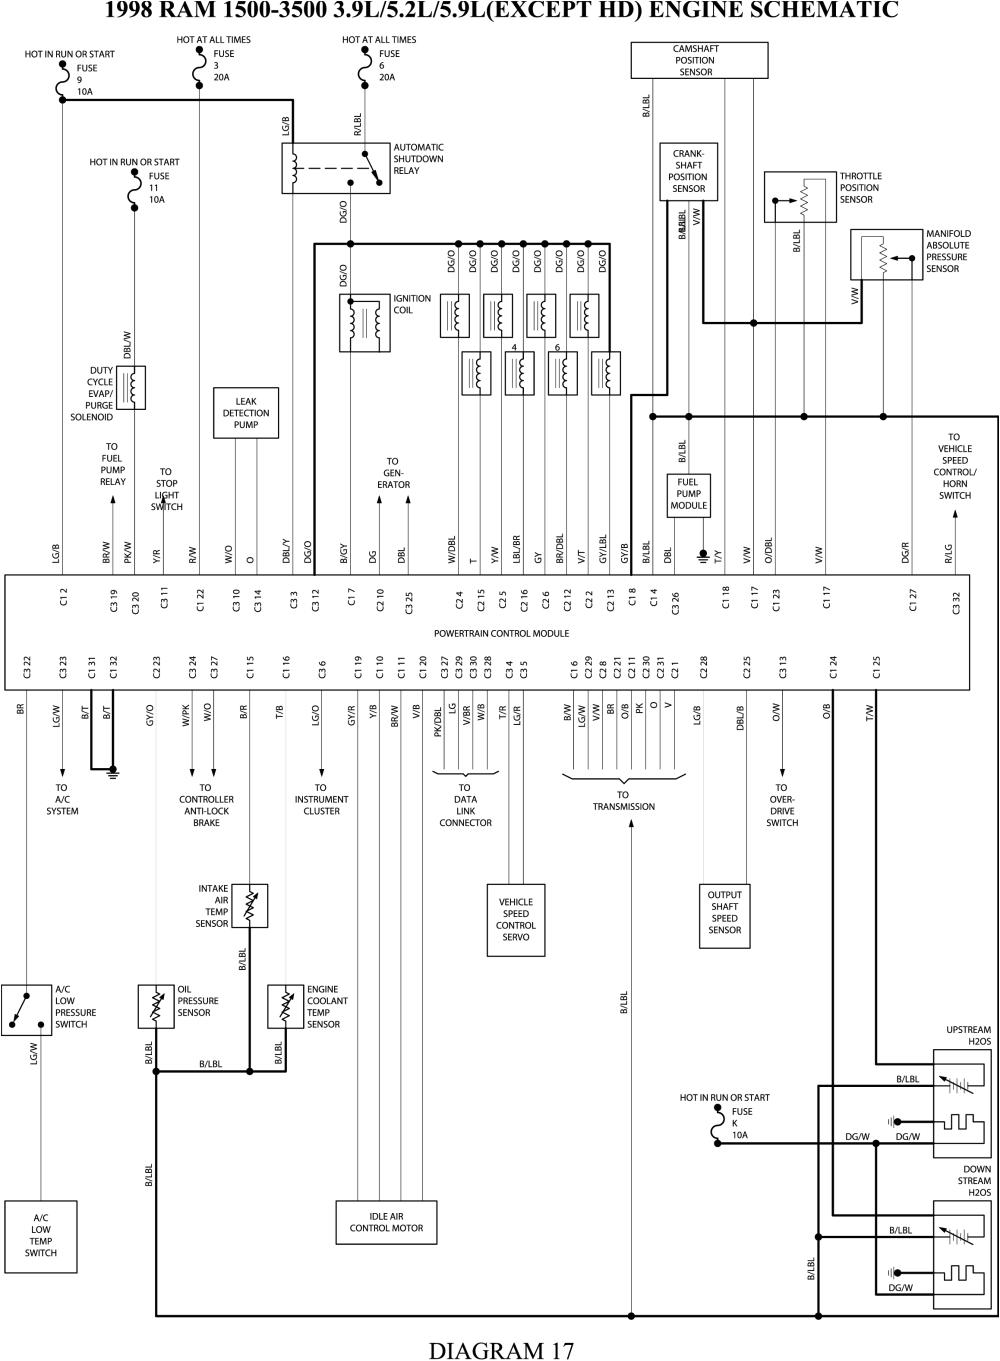 repair guides wiring diagrams wiring diagrams autozone com wiring diagram for 2000 dodge dakota